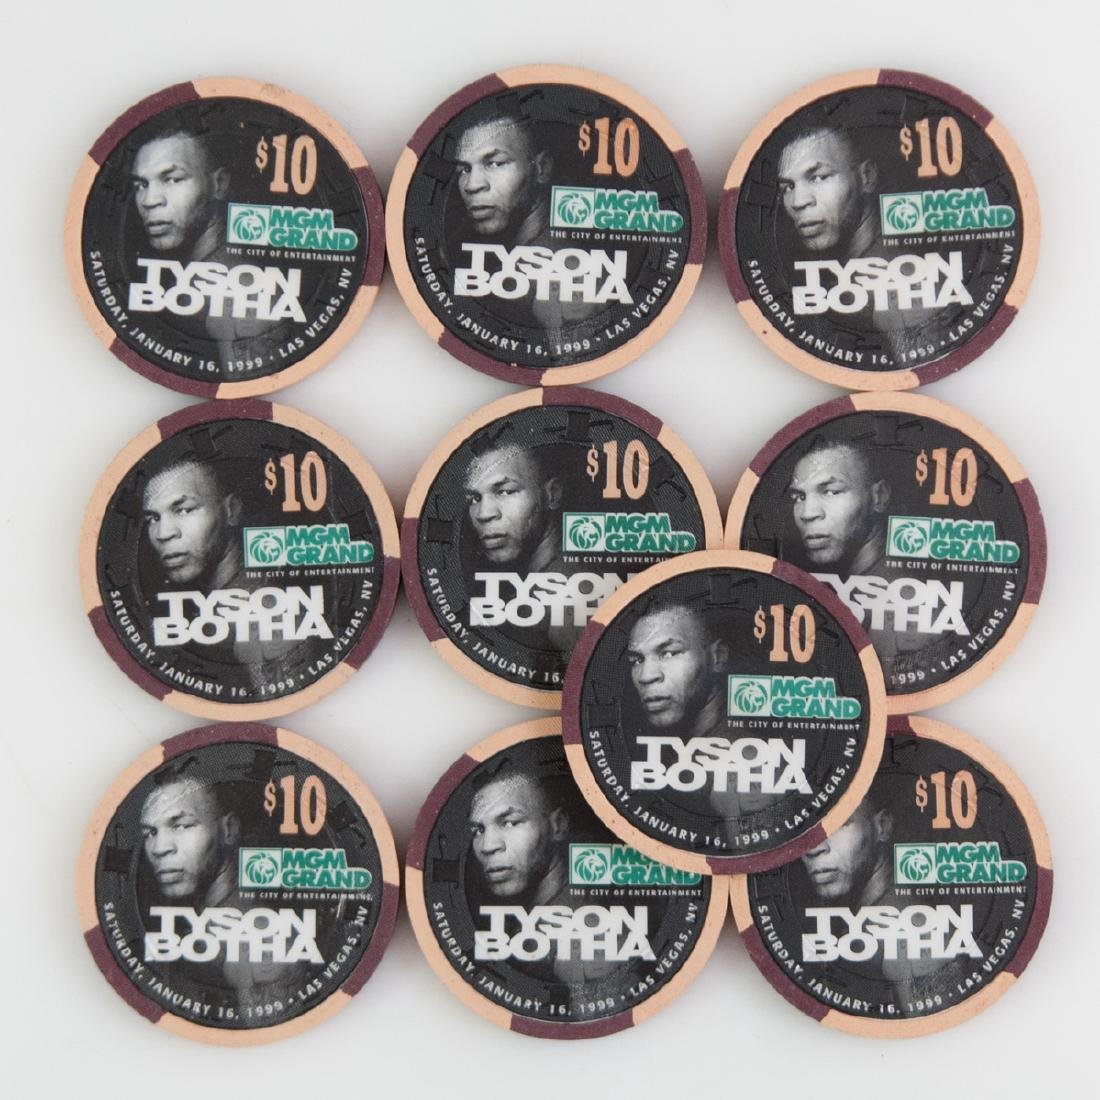 "MGM Grand 1999 ""Tyson Botha"" Chips"